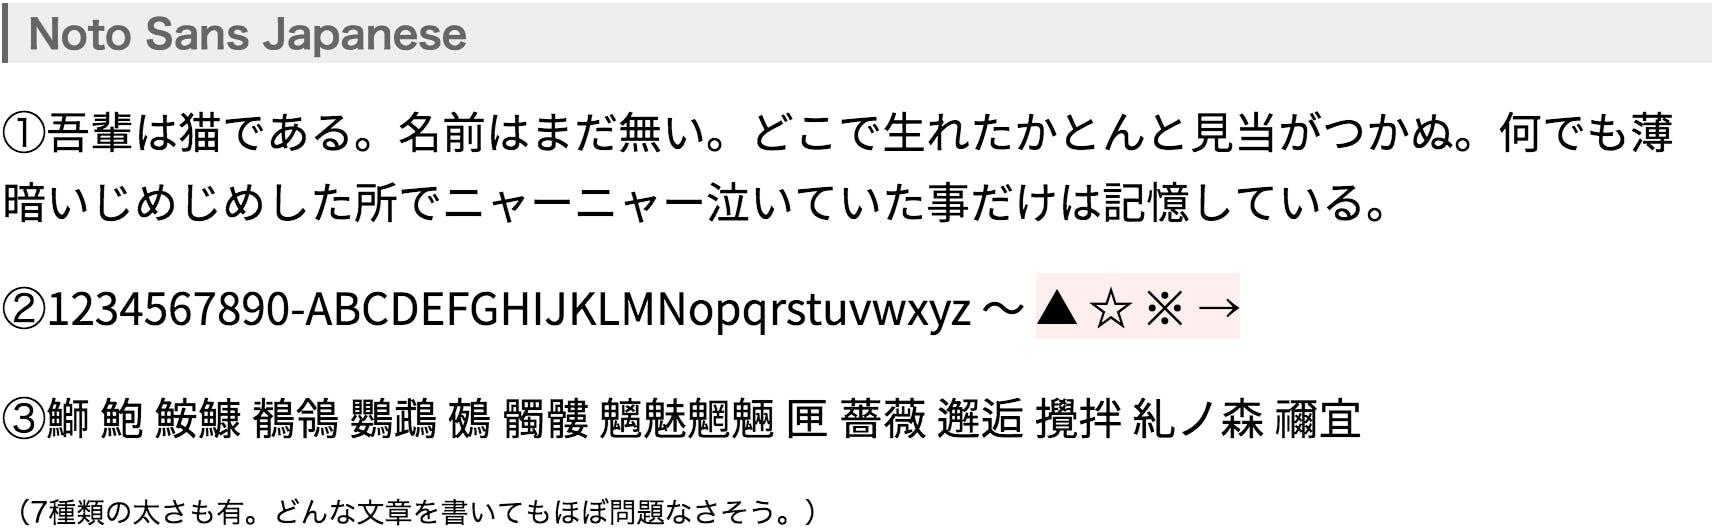 Noto Serif Japanese」を使ってみたので、自分用メモ。 - Qiita